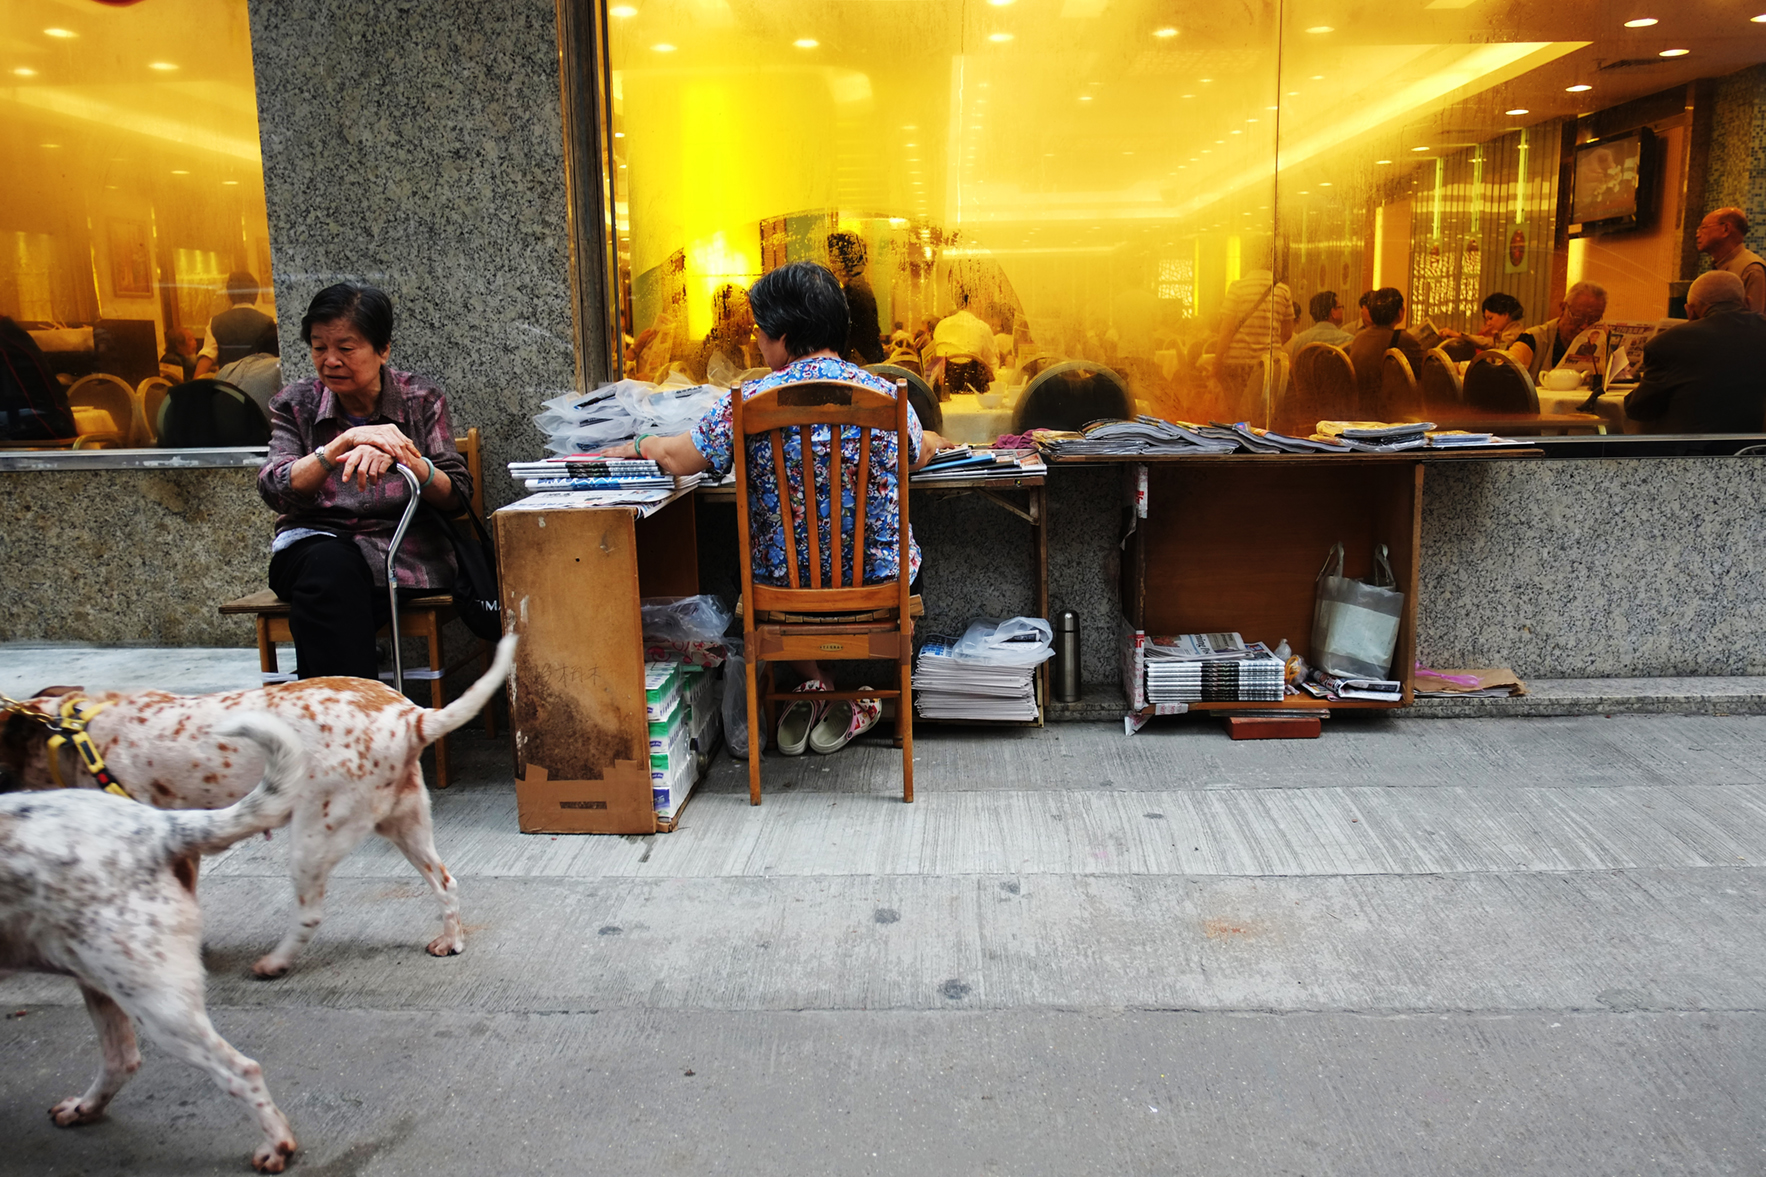 Paper sellers. Hong Kong. 2012